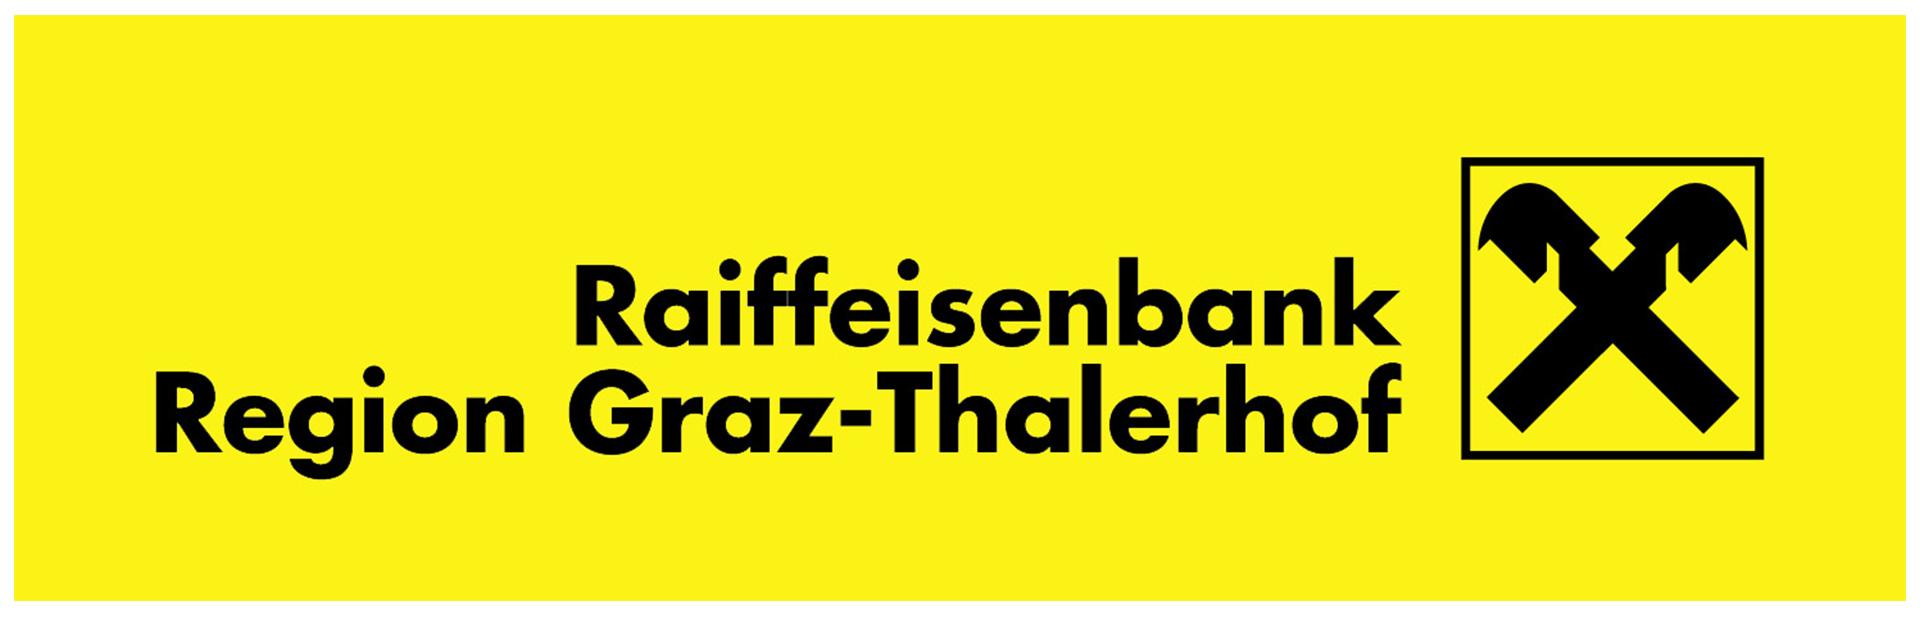 Raiffeisenbank Region Graz-Thalerhof